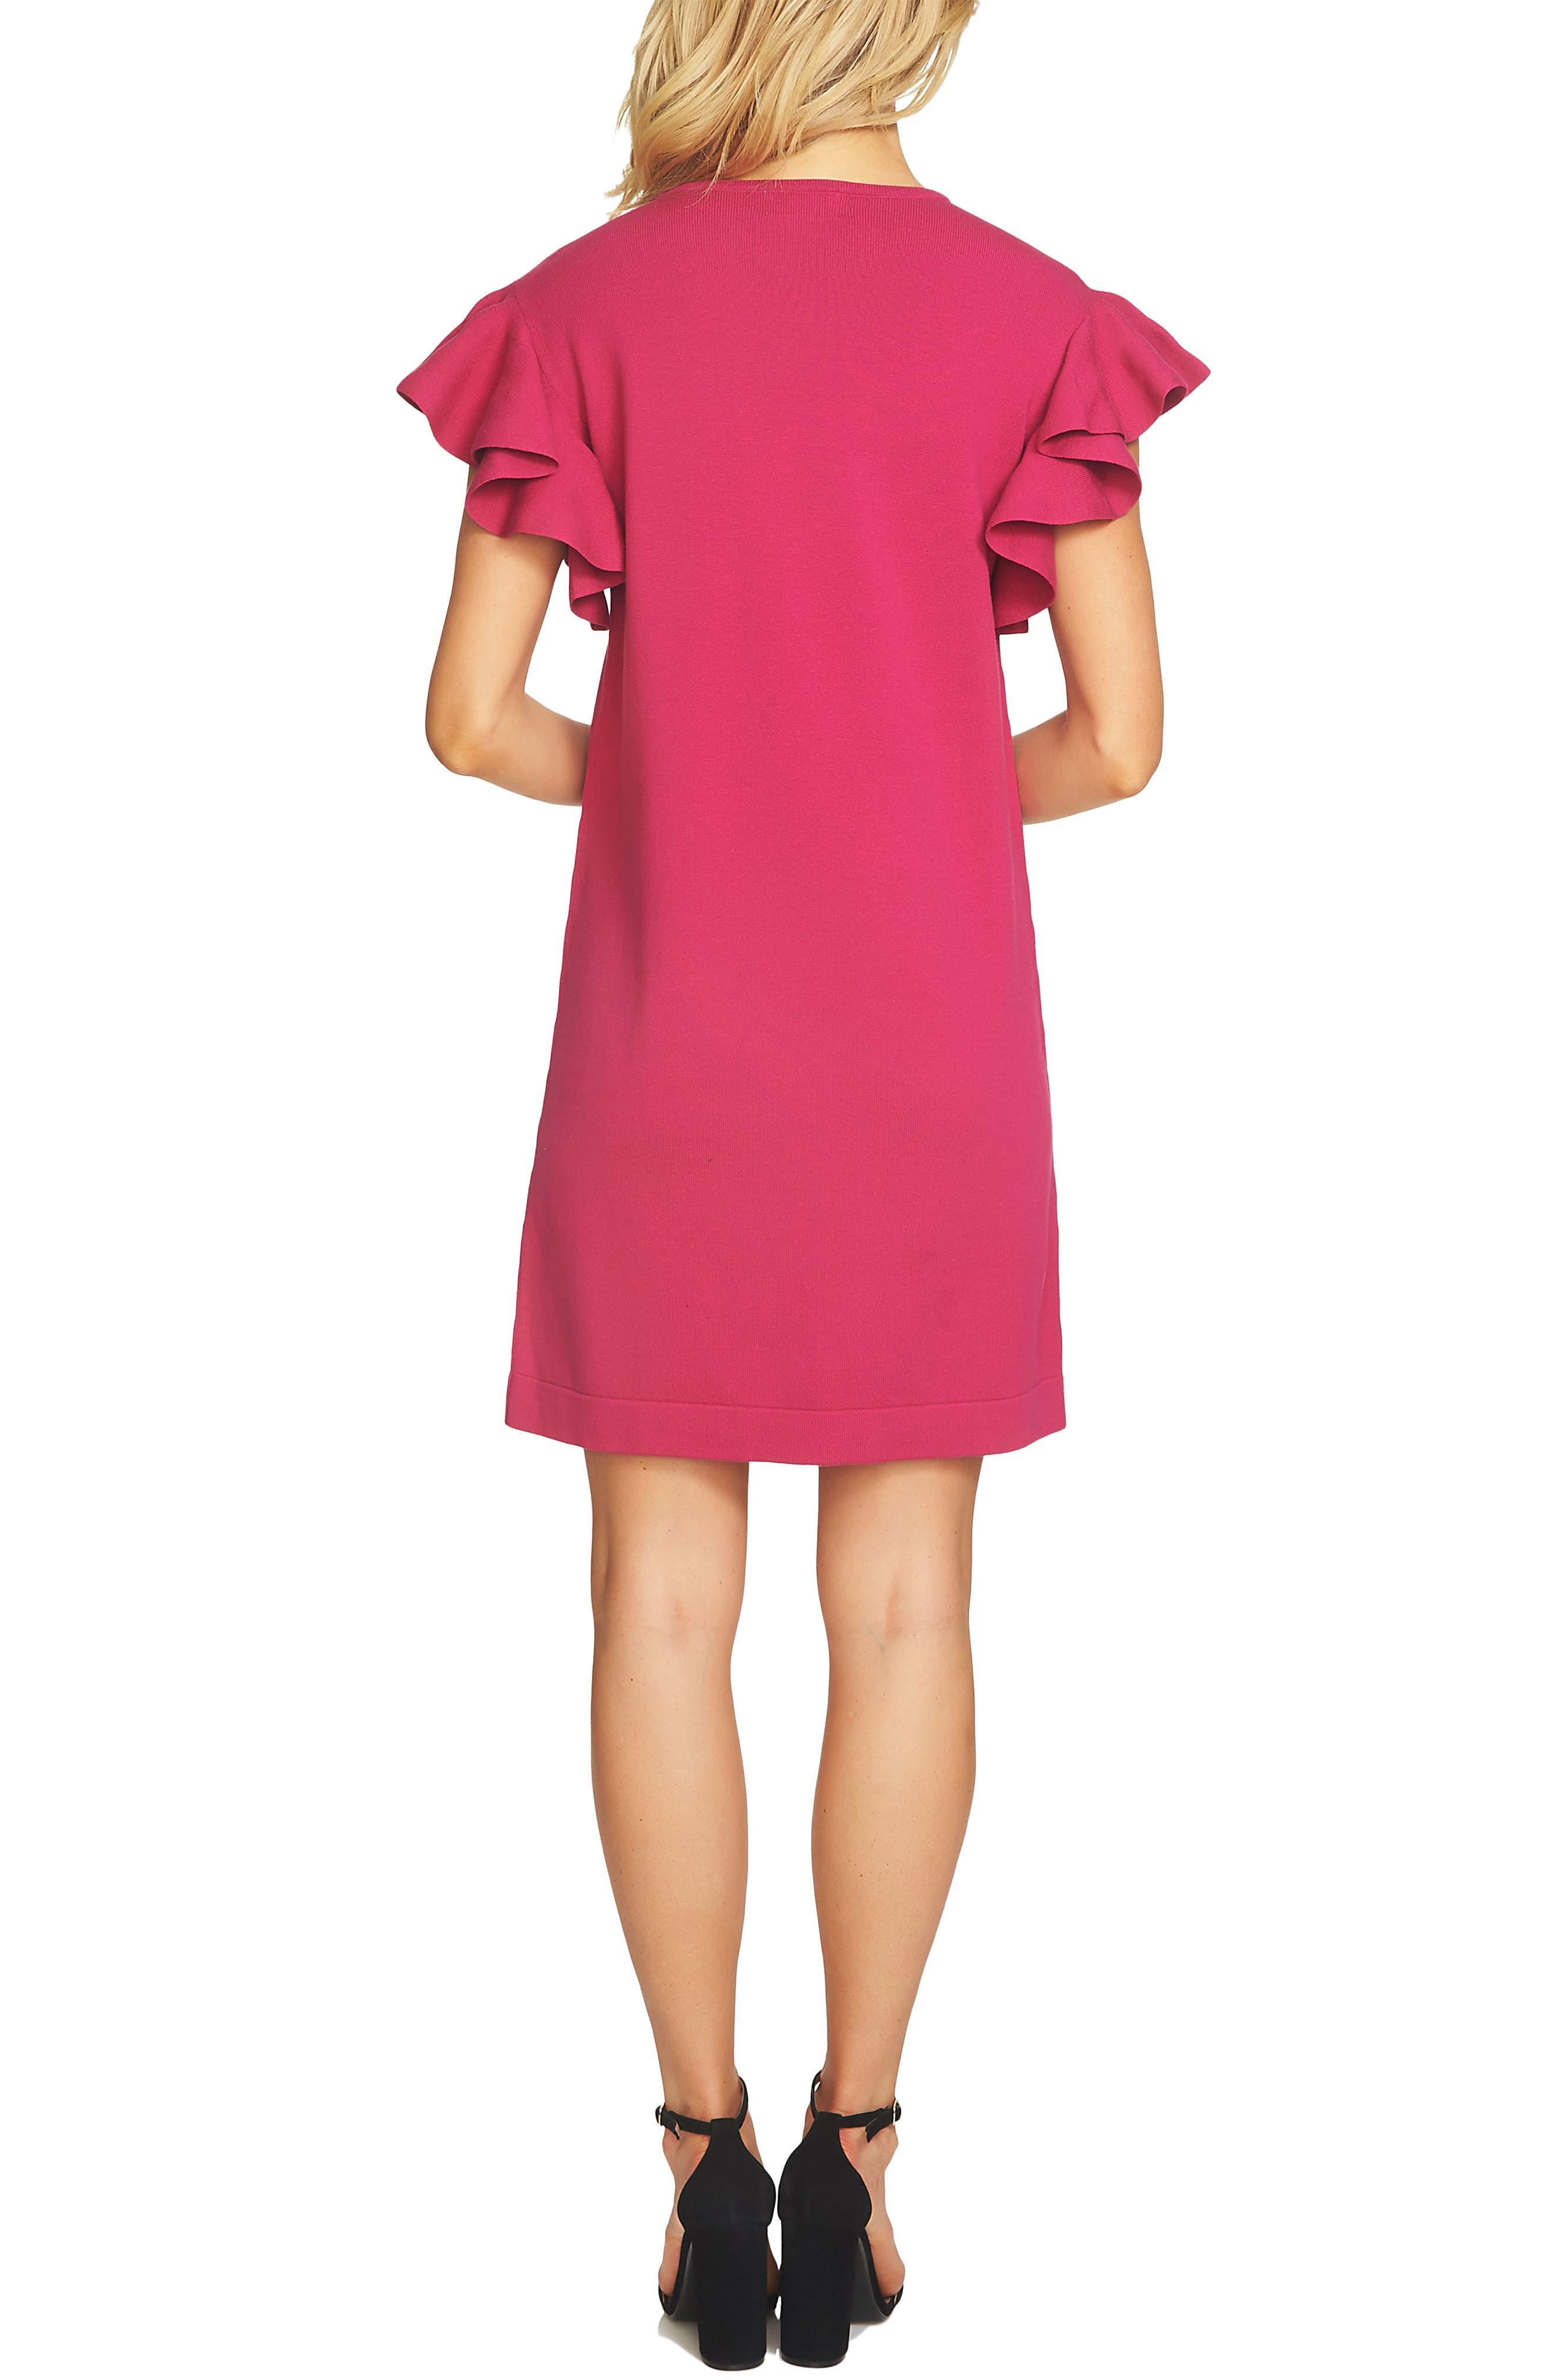 Ruffle Sleeve Sweater Dress,                             Alternate thumbnail 2, color,                             674